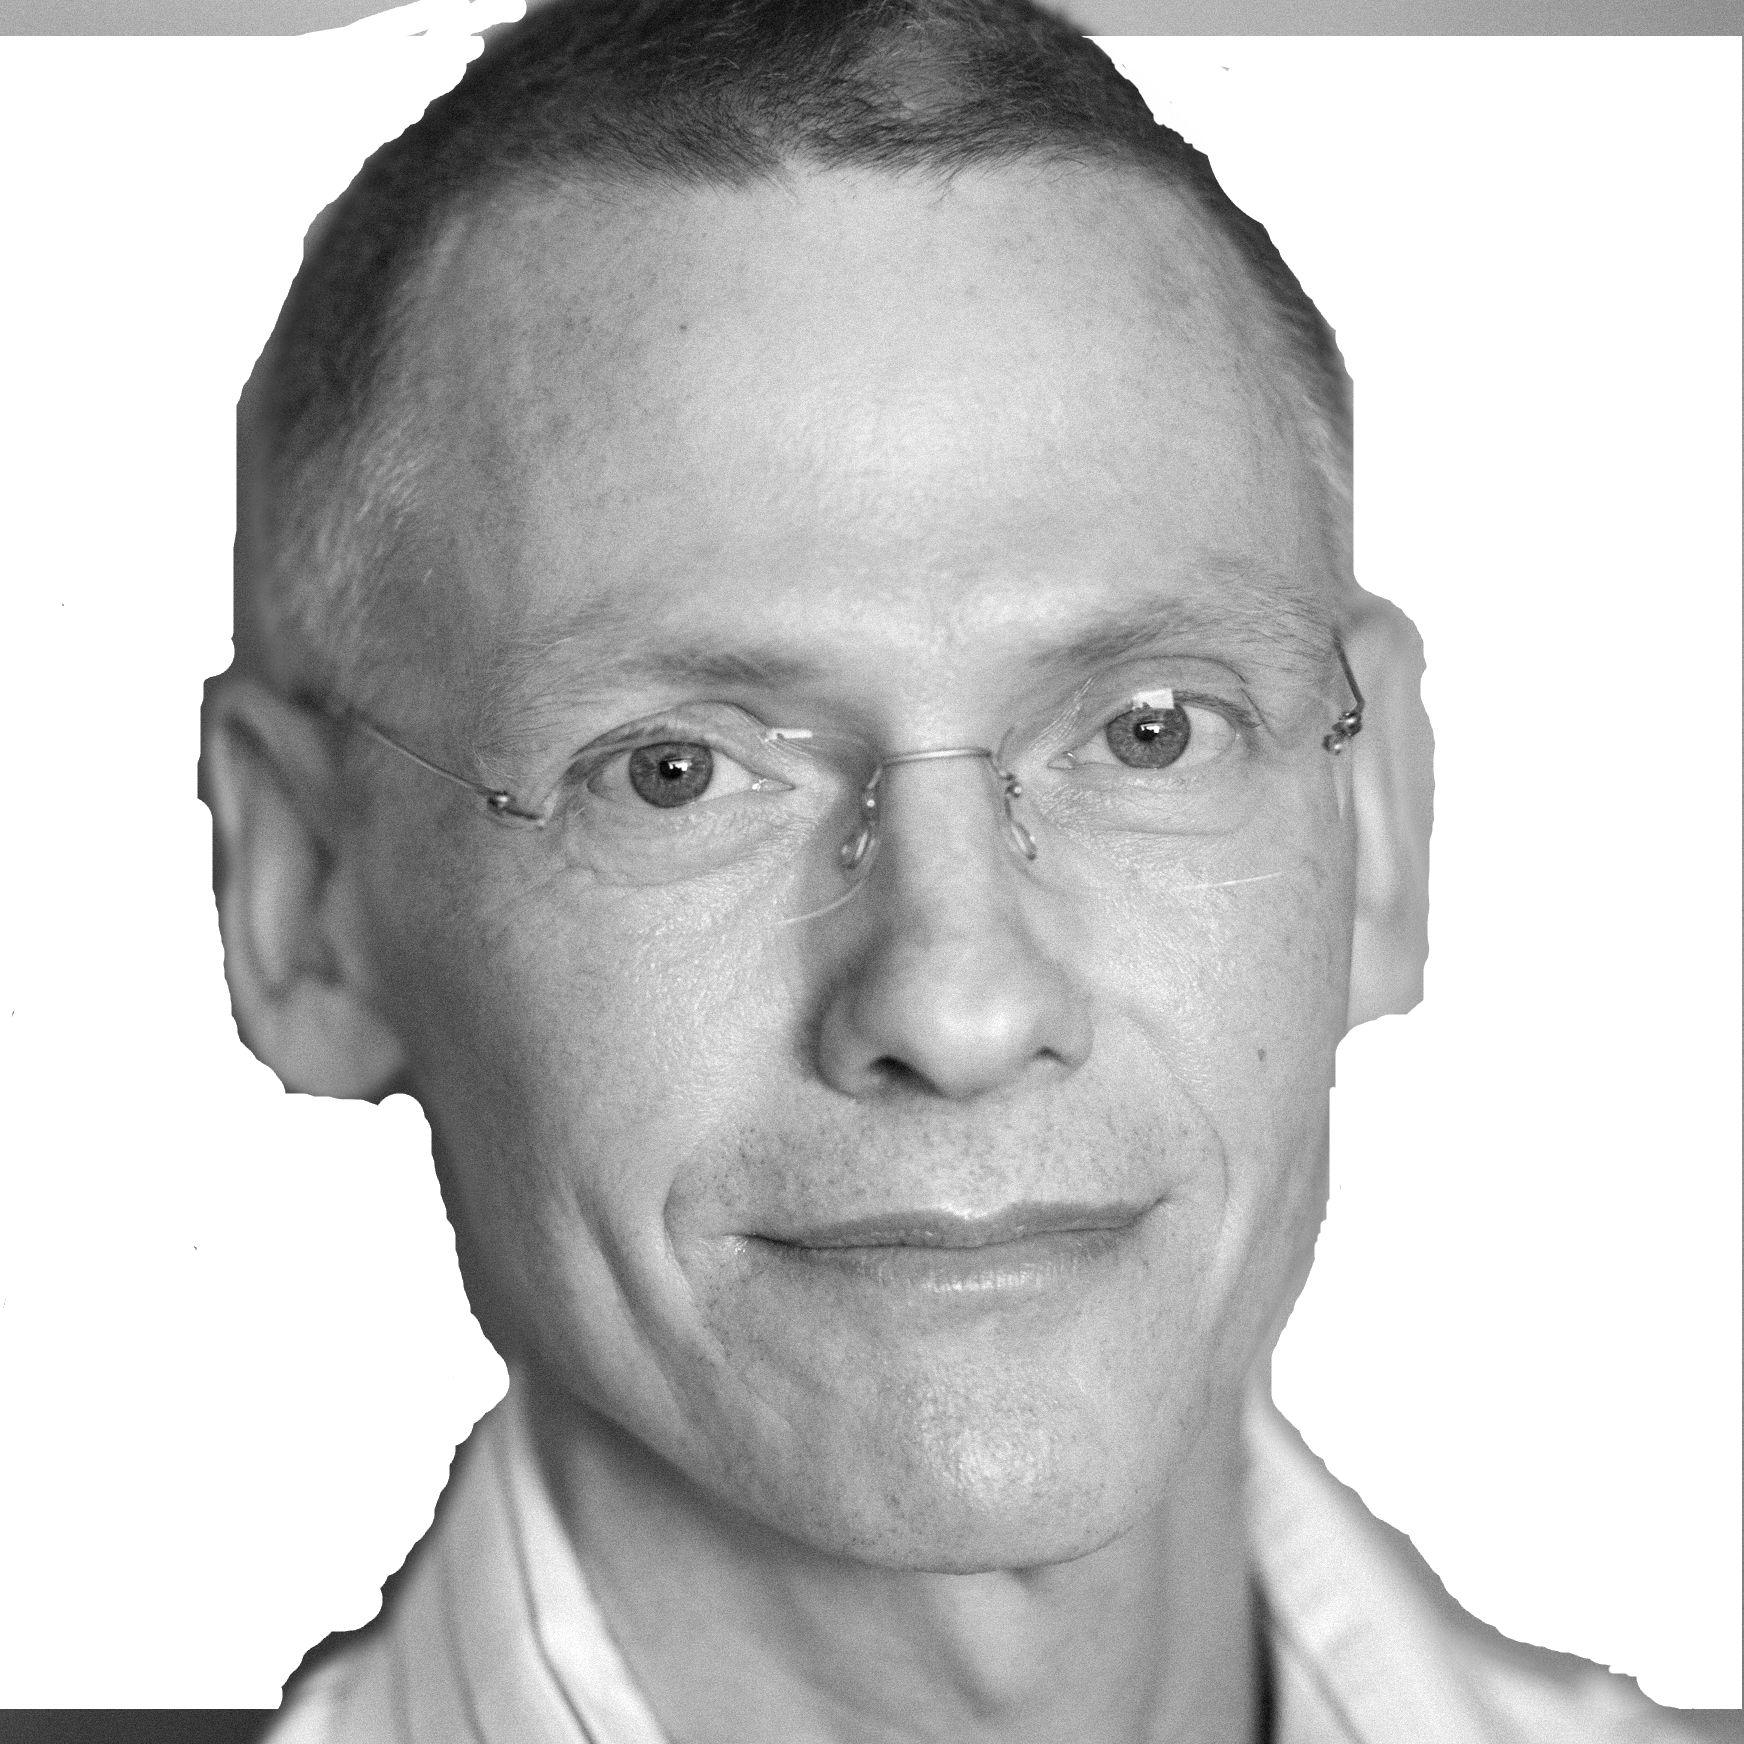 Daniel Tietz